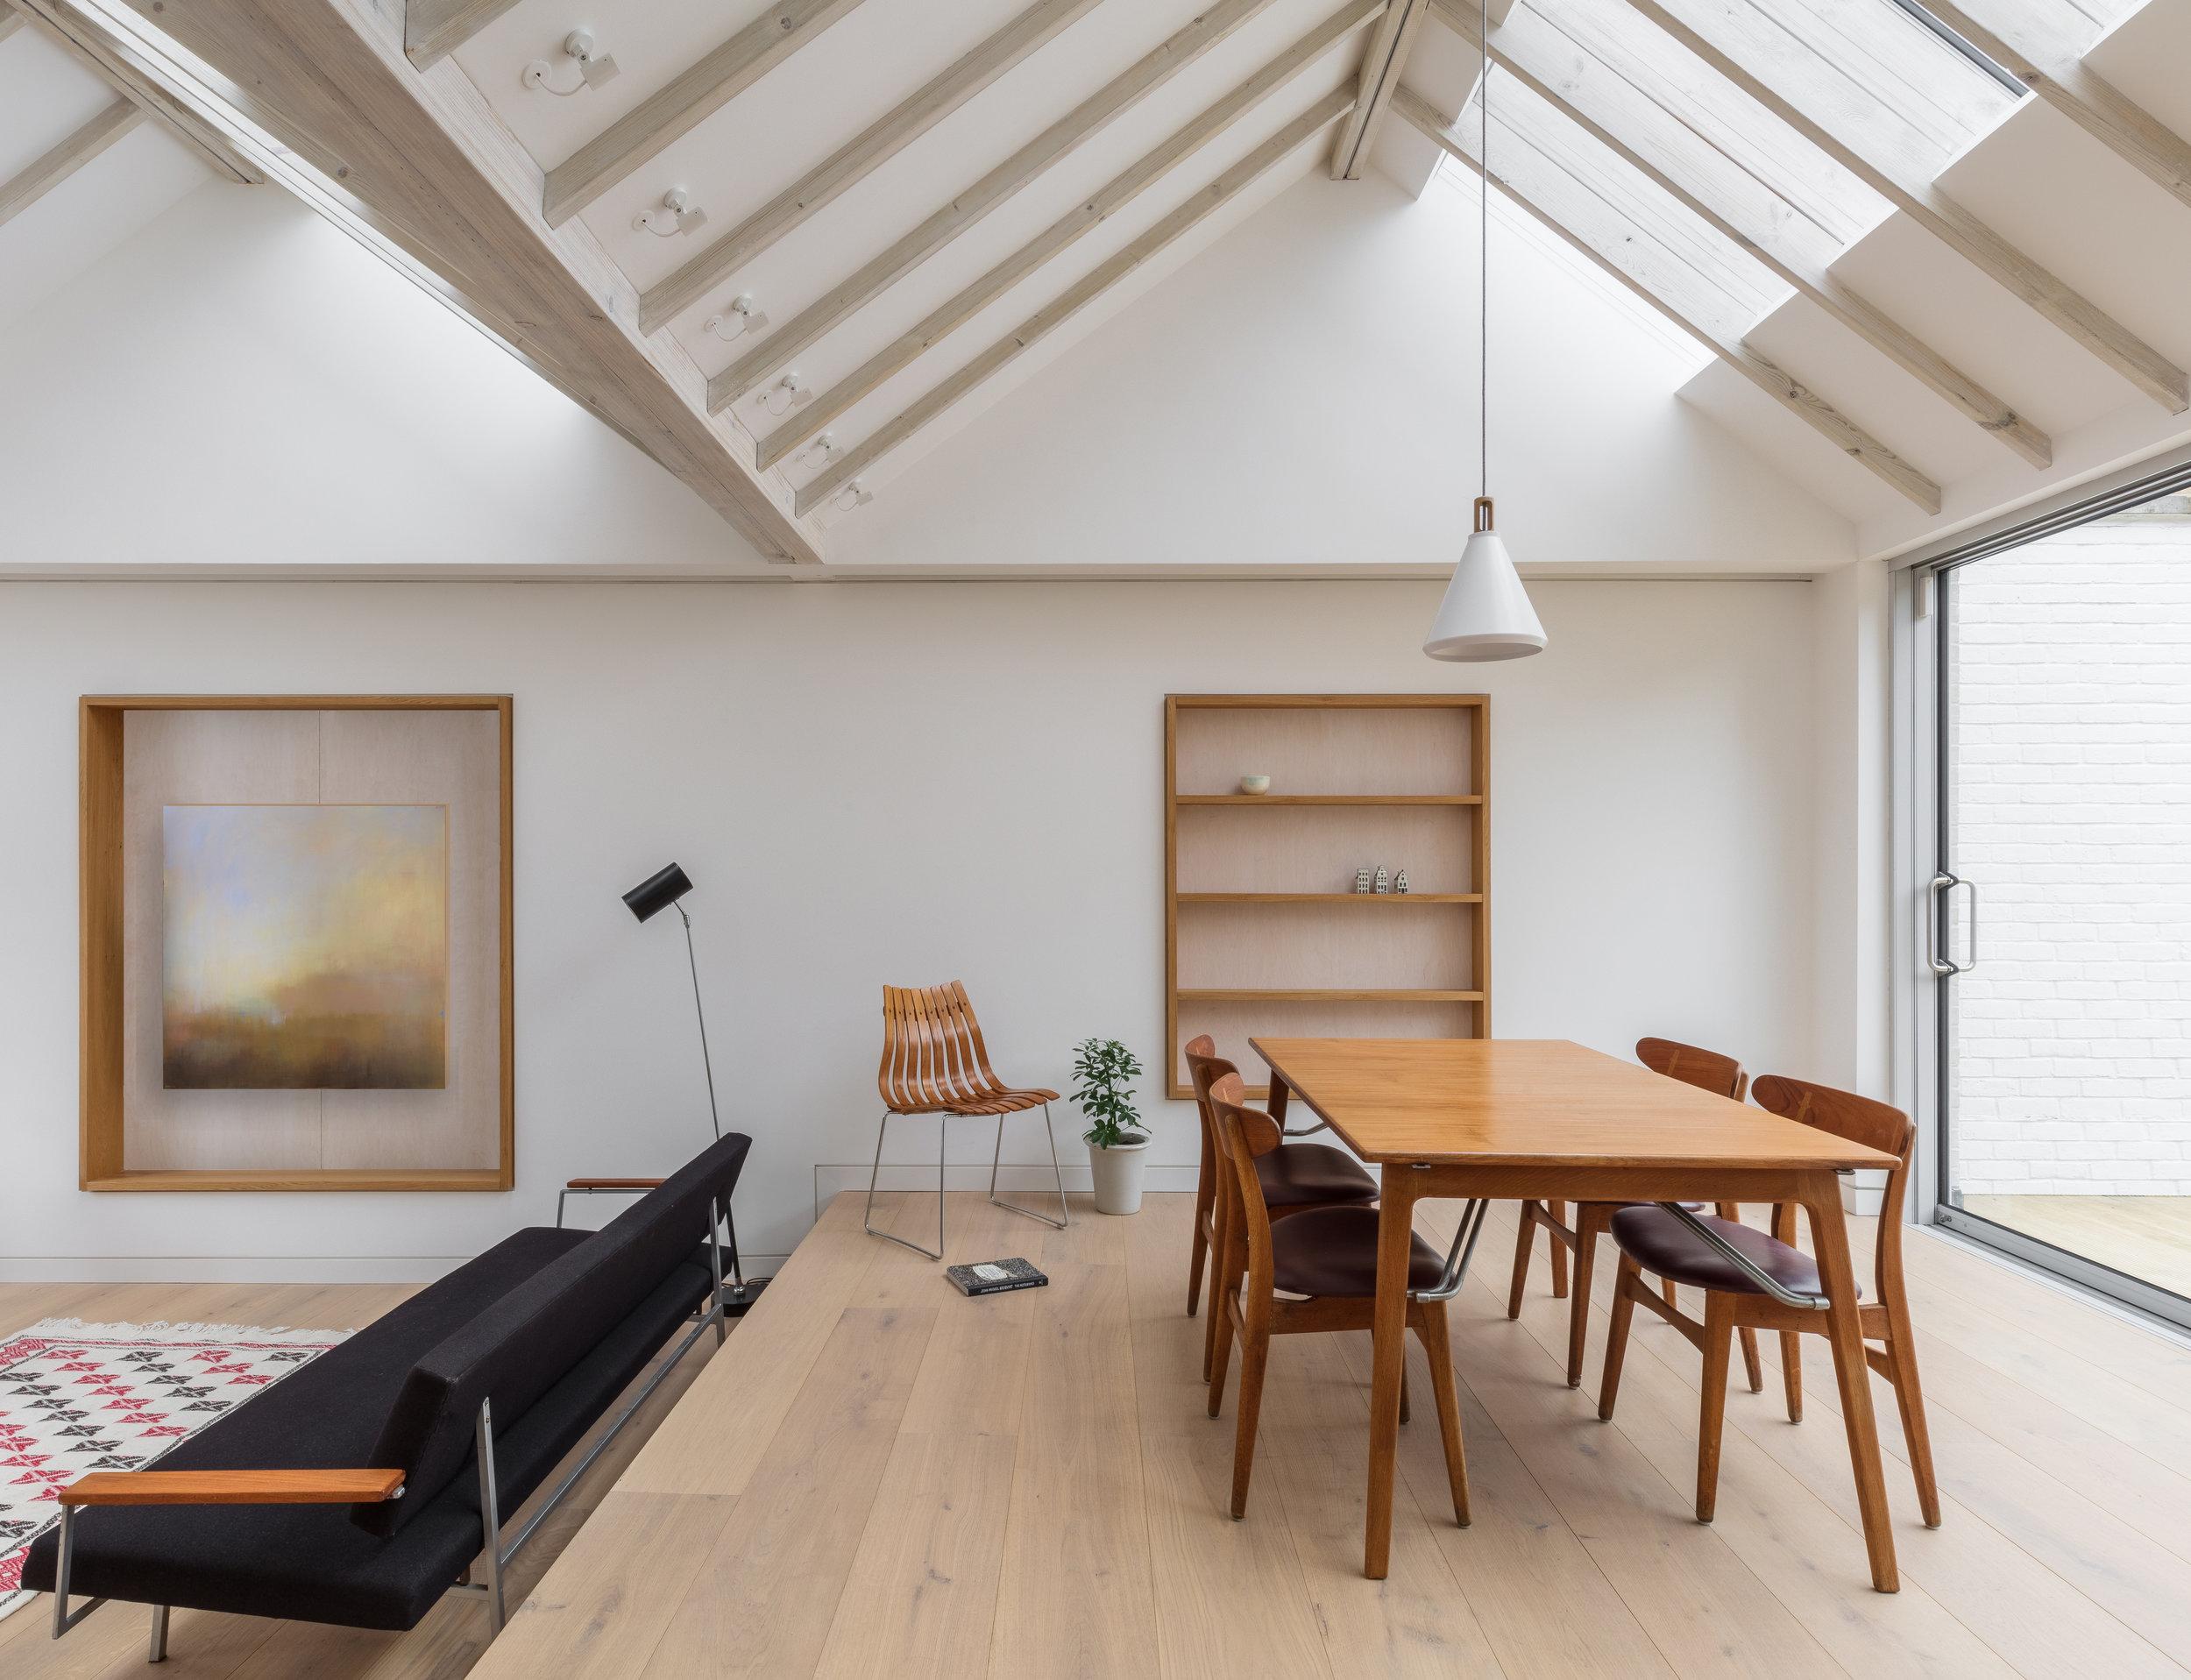 Vine Architecture Studio - Mile End Road-6 © Nicholas Worley.jpg